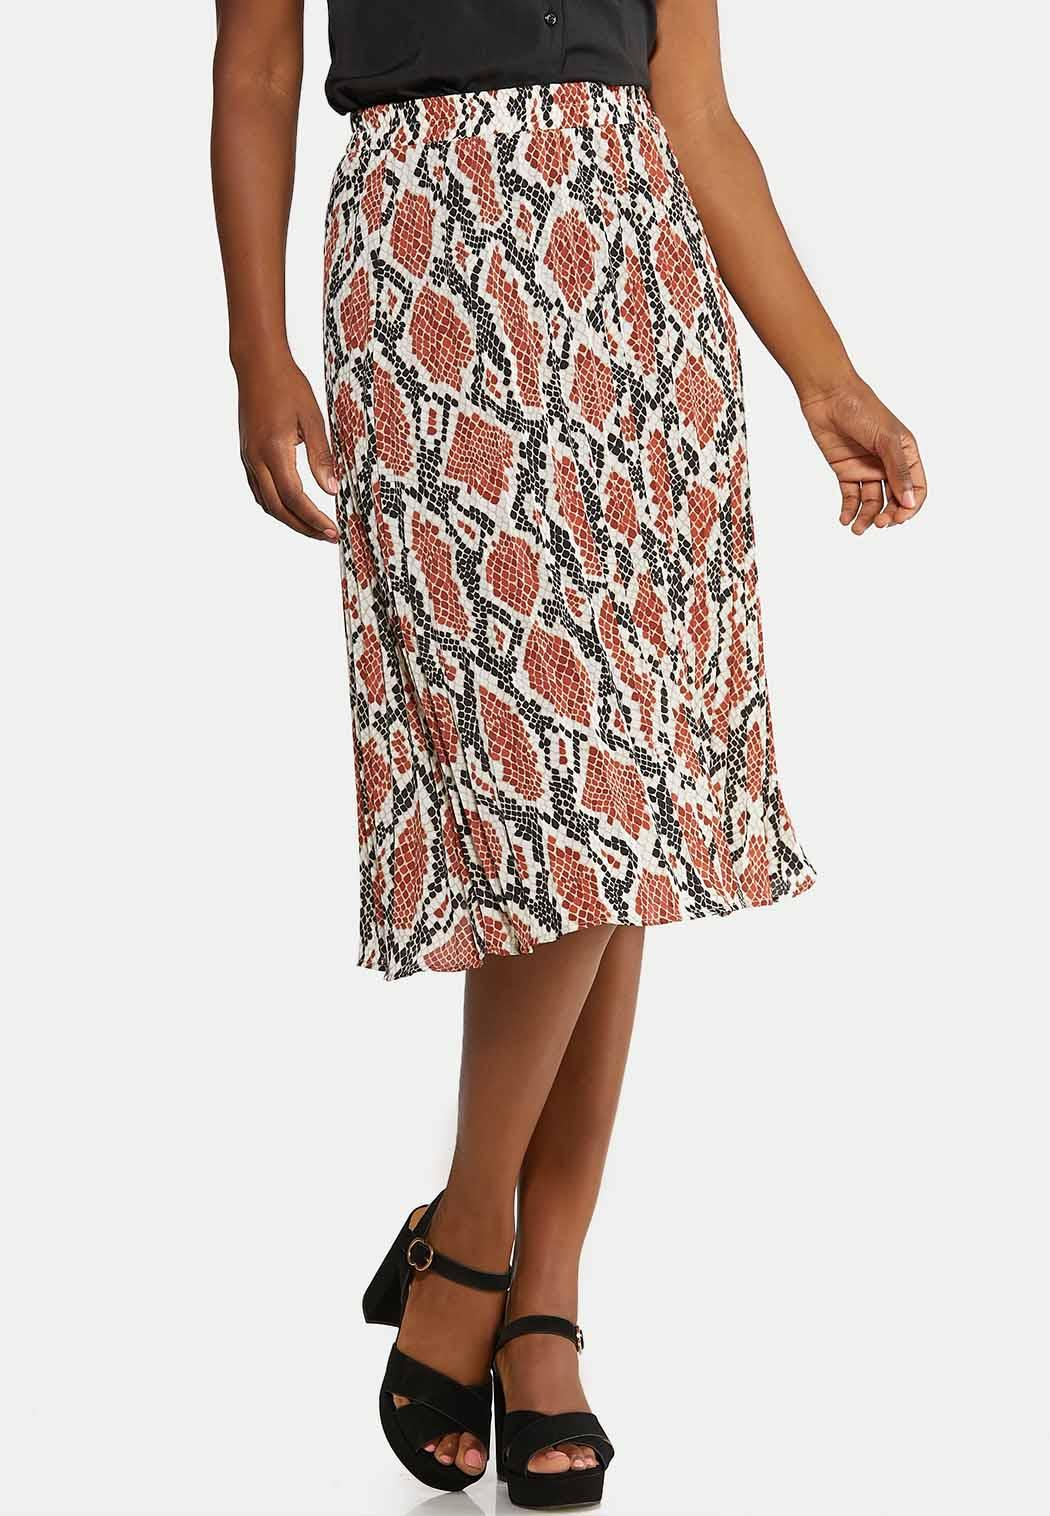 Plus Size Pleated Snakeskin Skirt